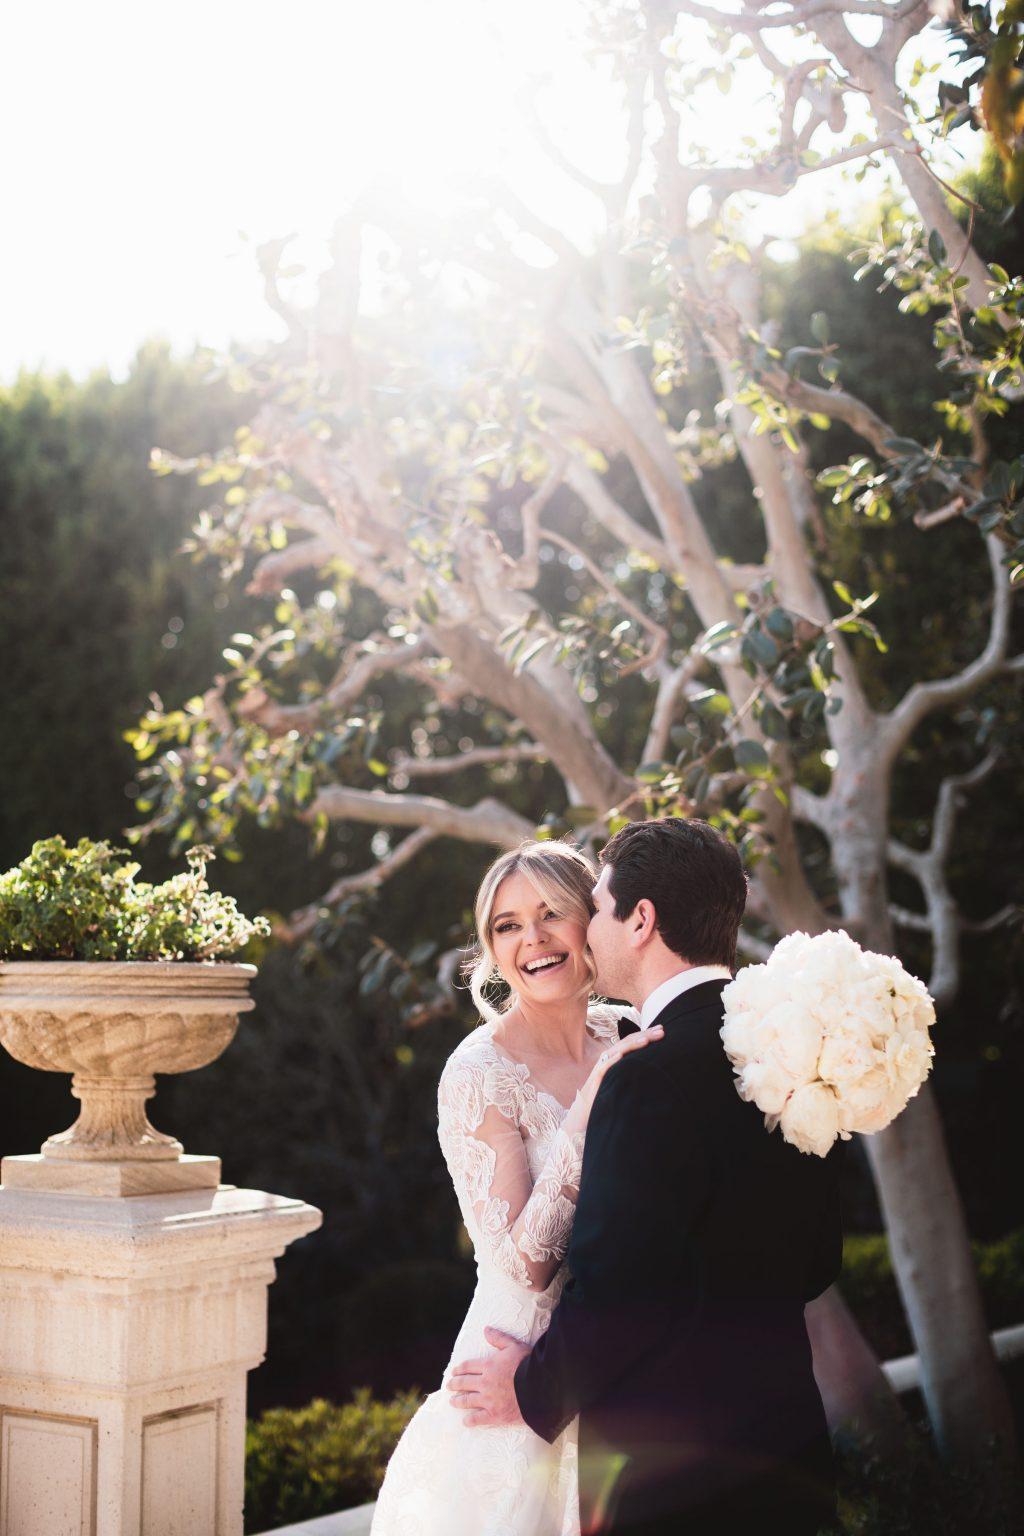 ashley-maxx-beverly-hills-wedding-140